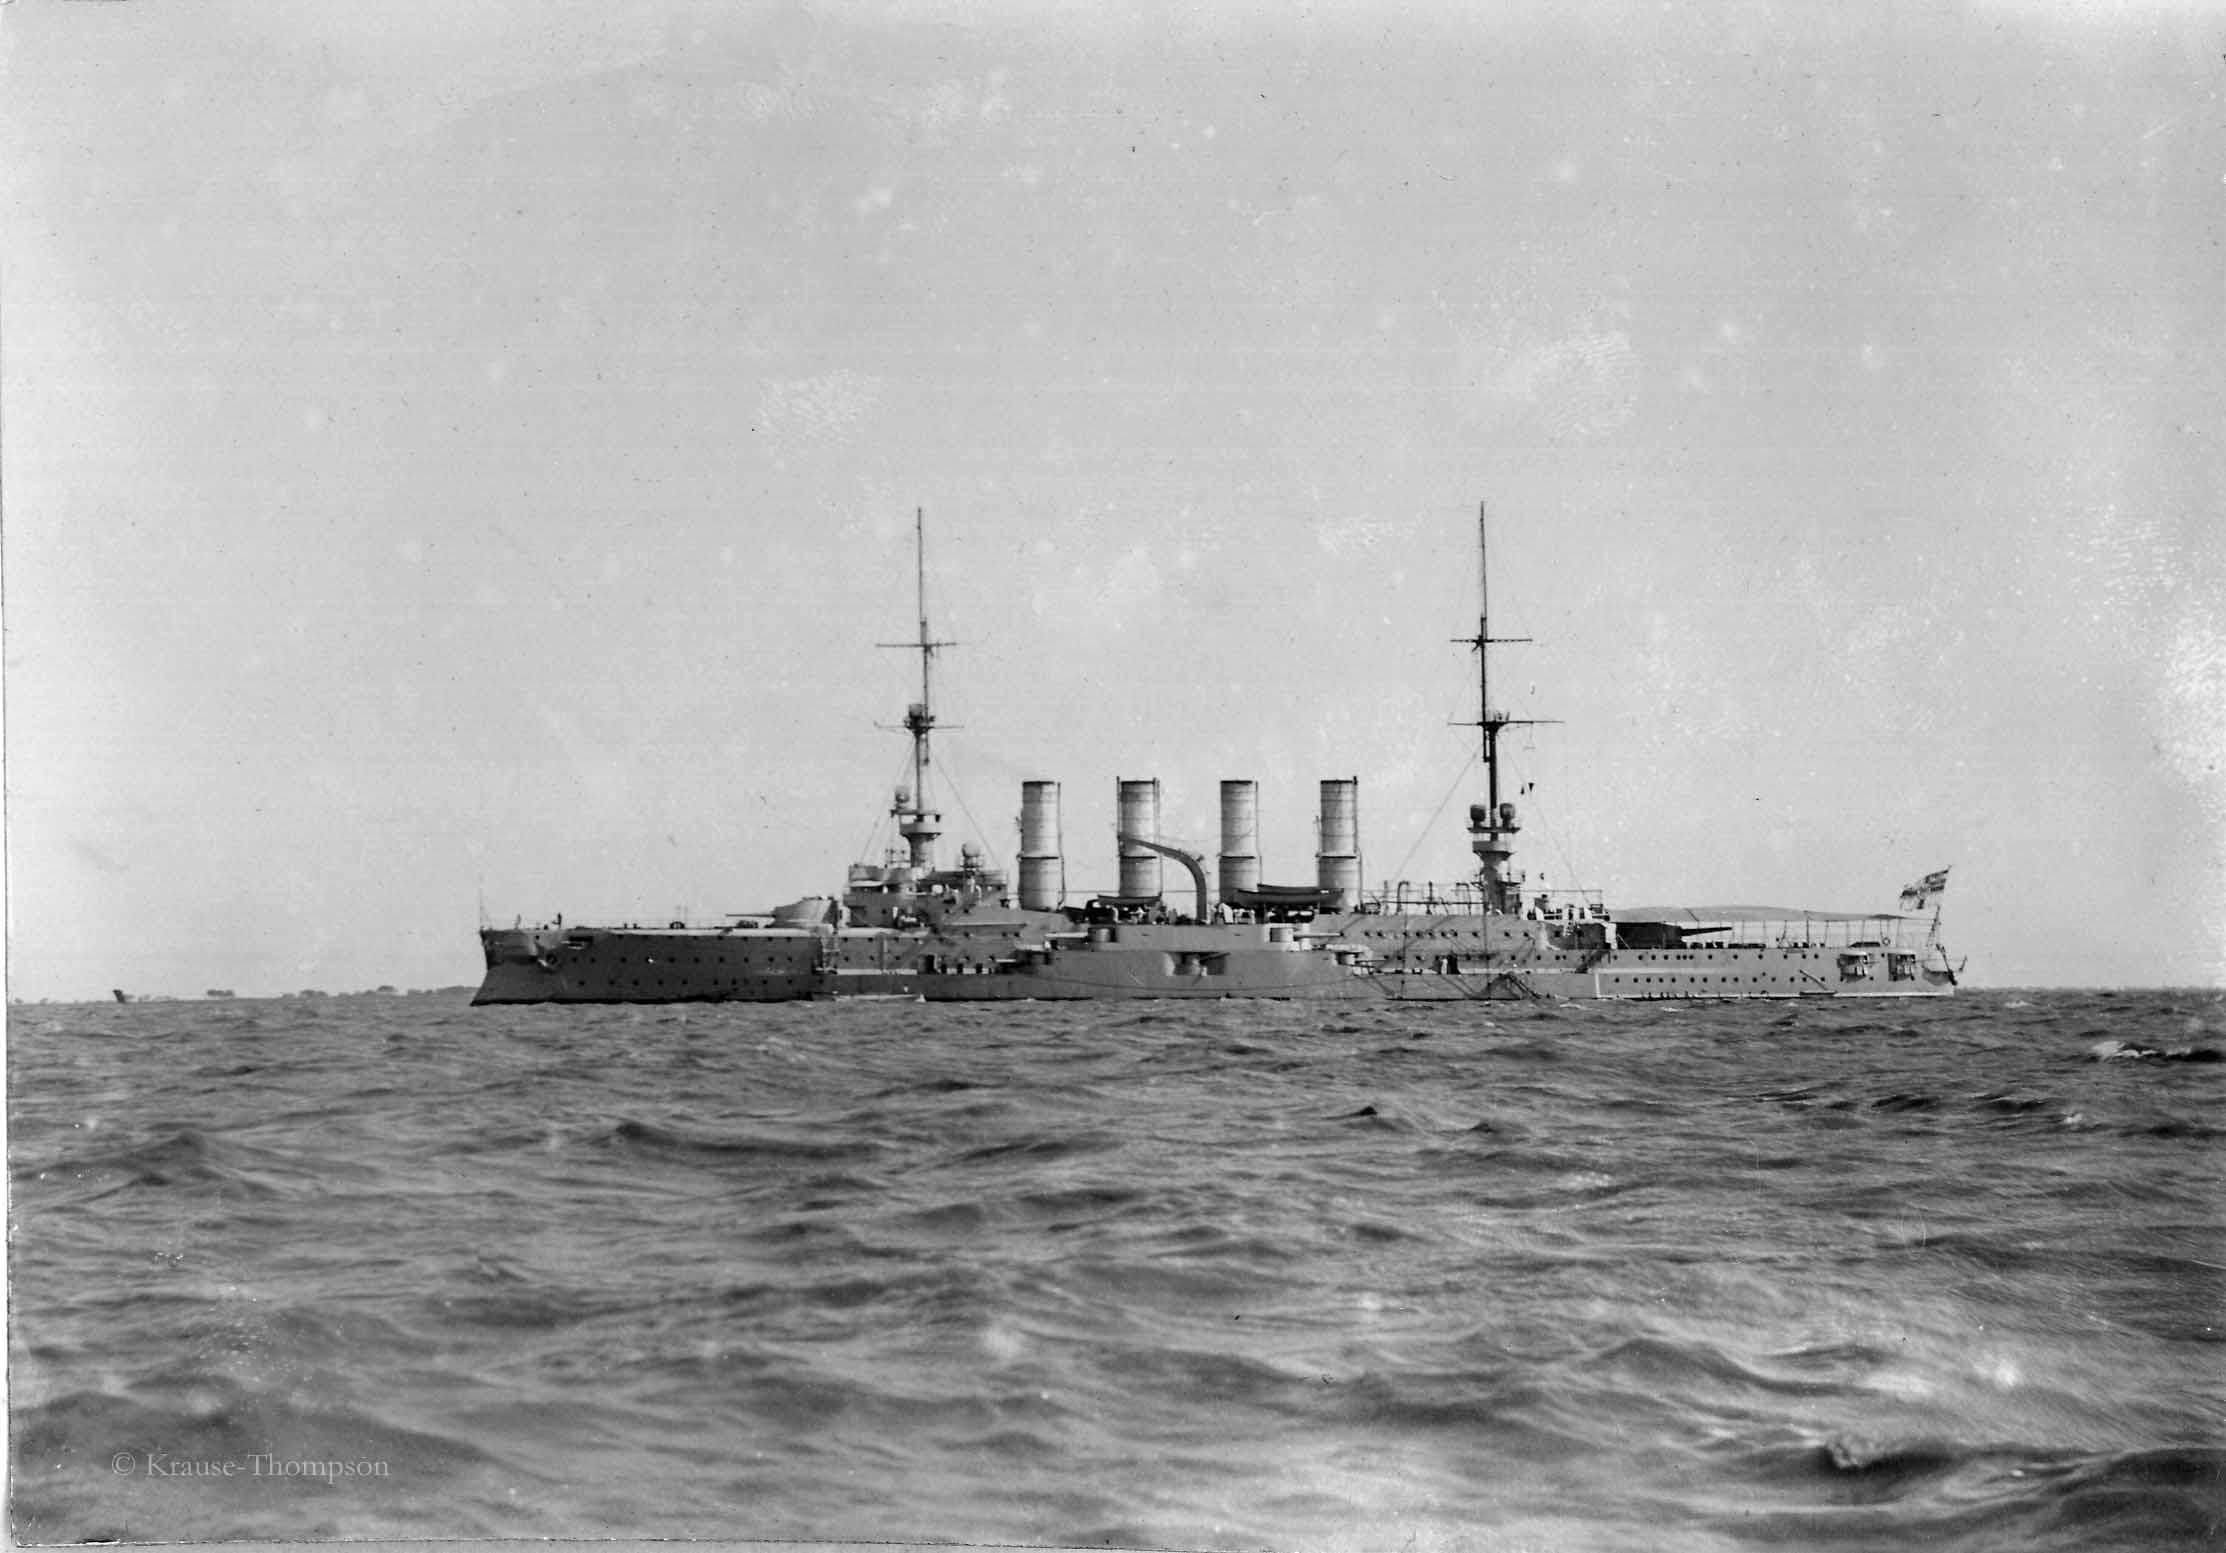 SMS Gneisenau, armored cruiser of the German navy